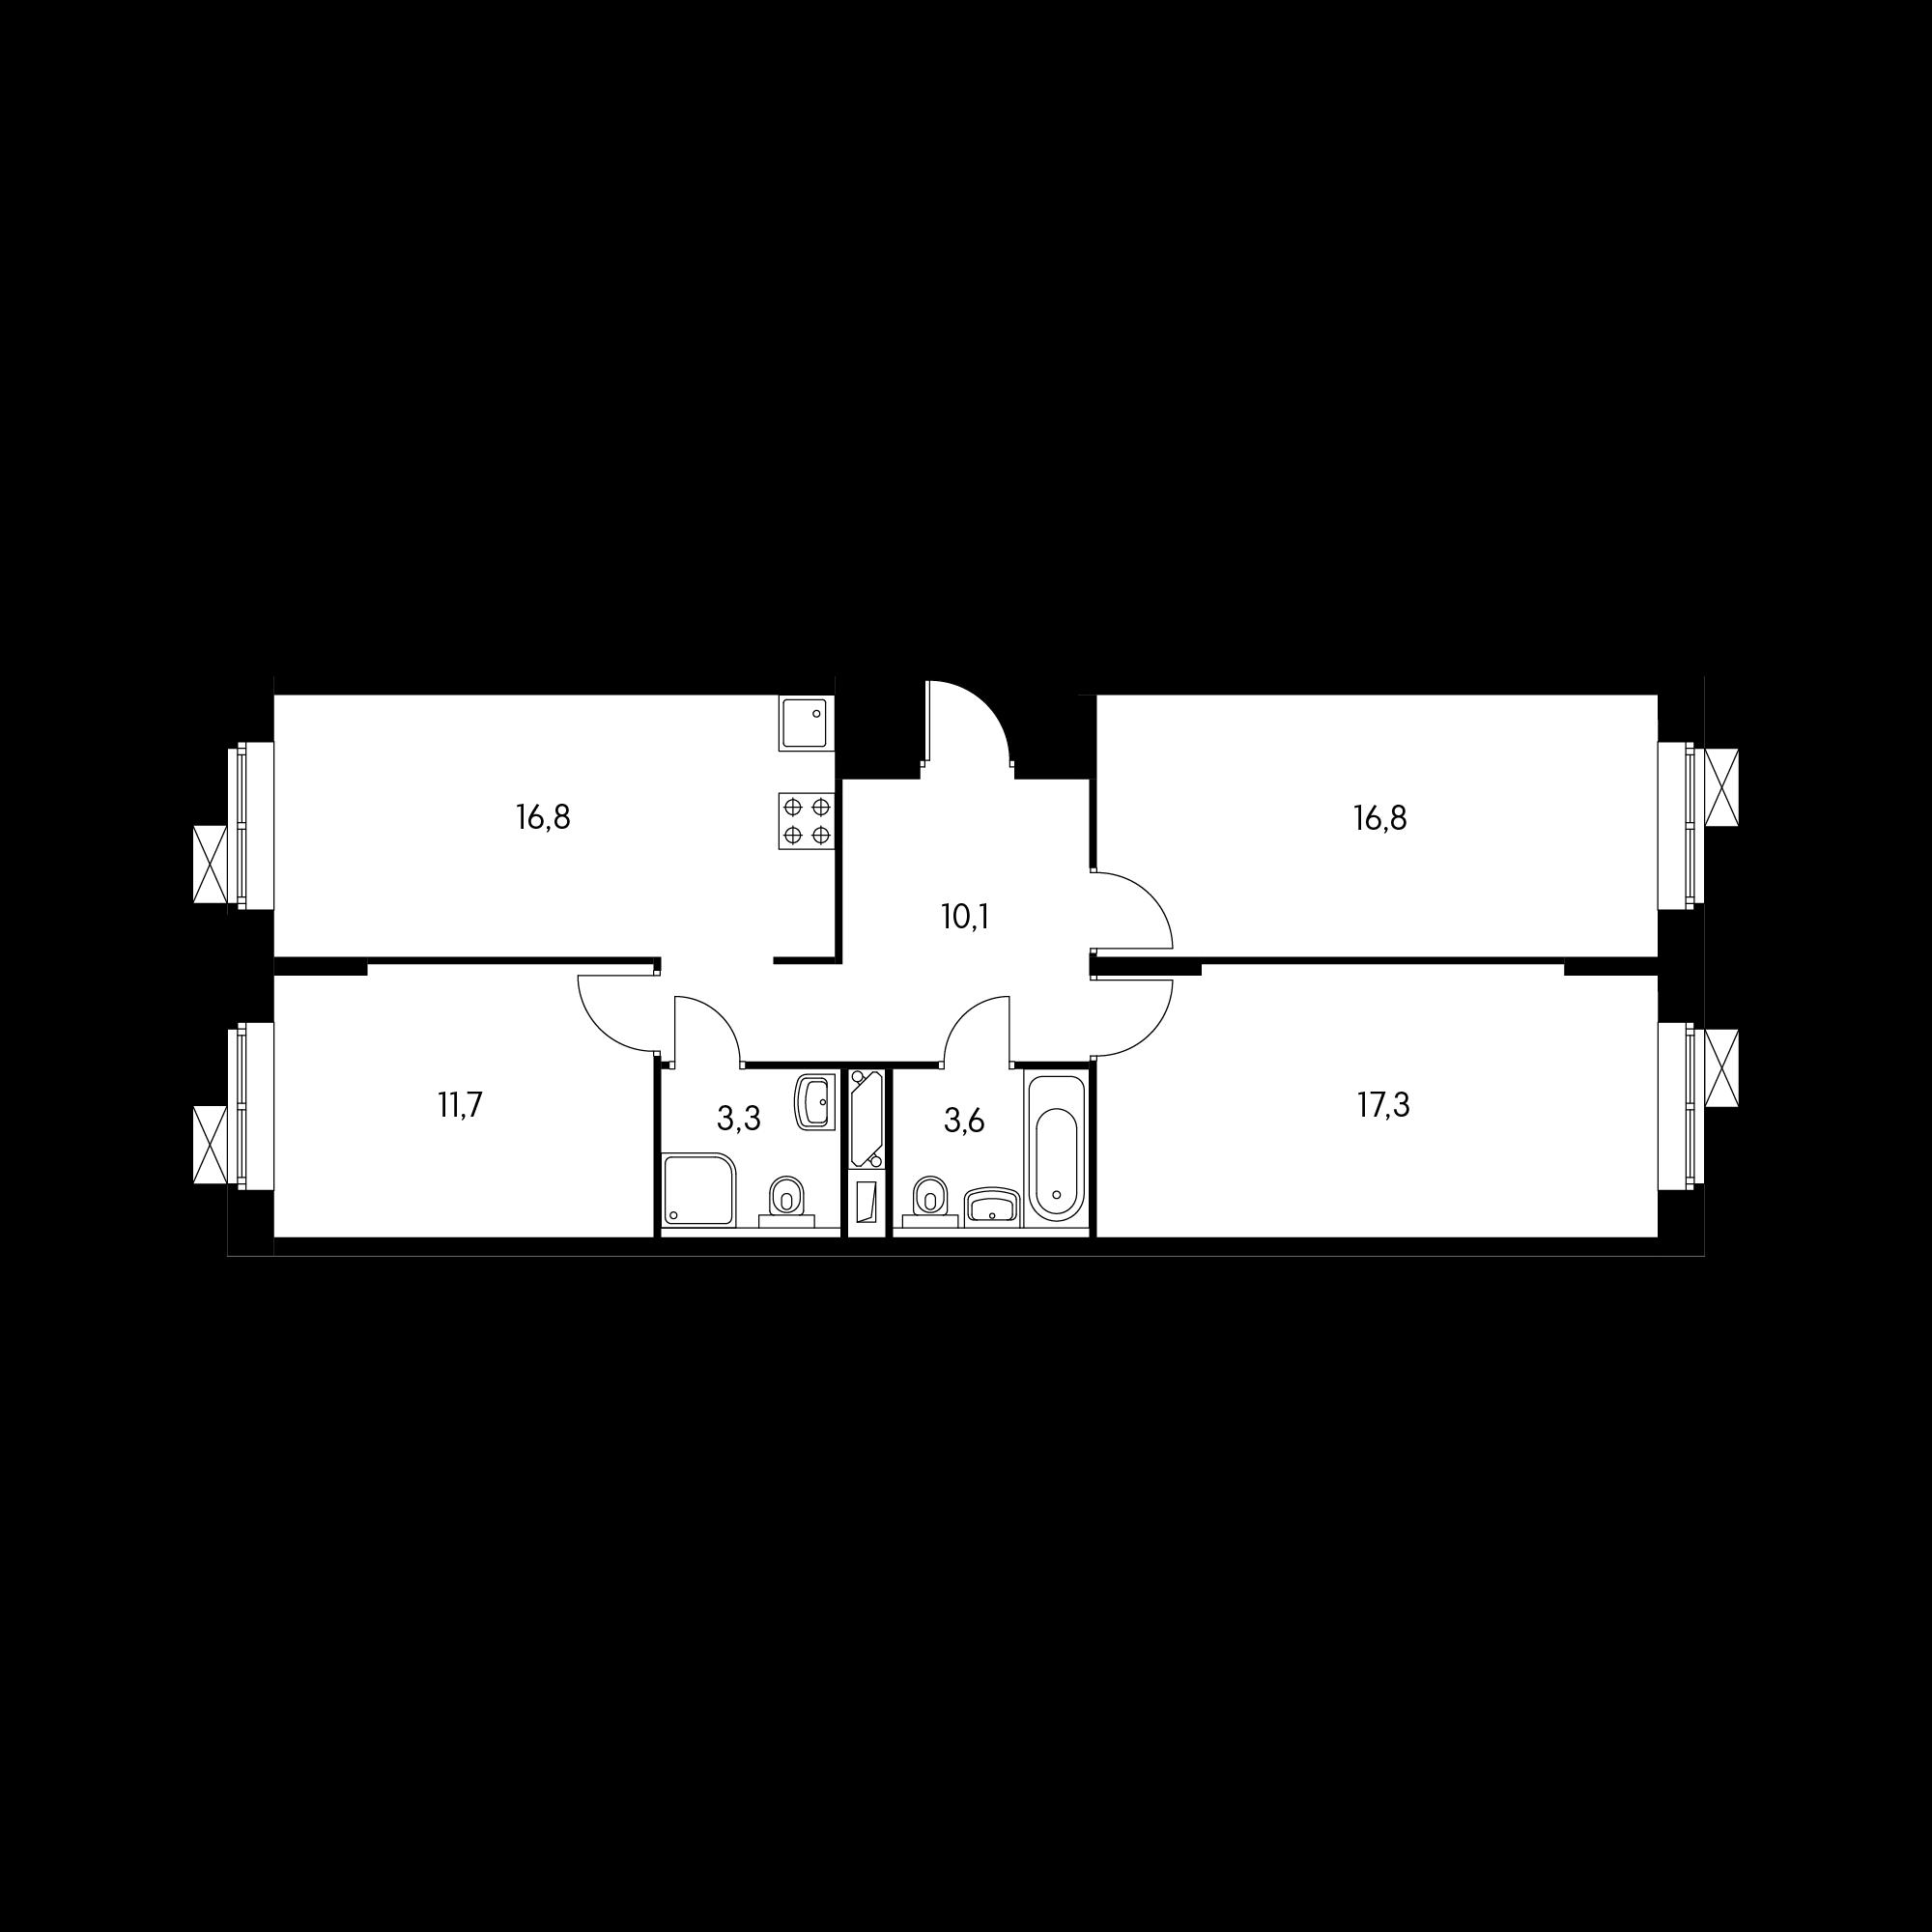 3EM5.02